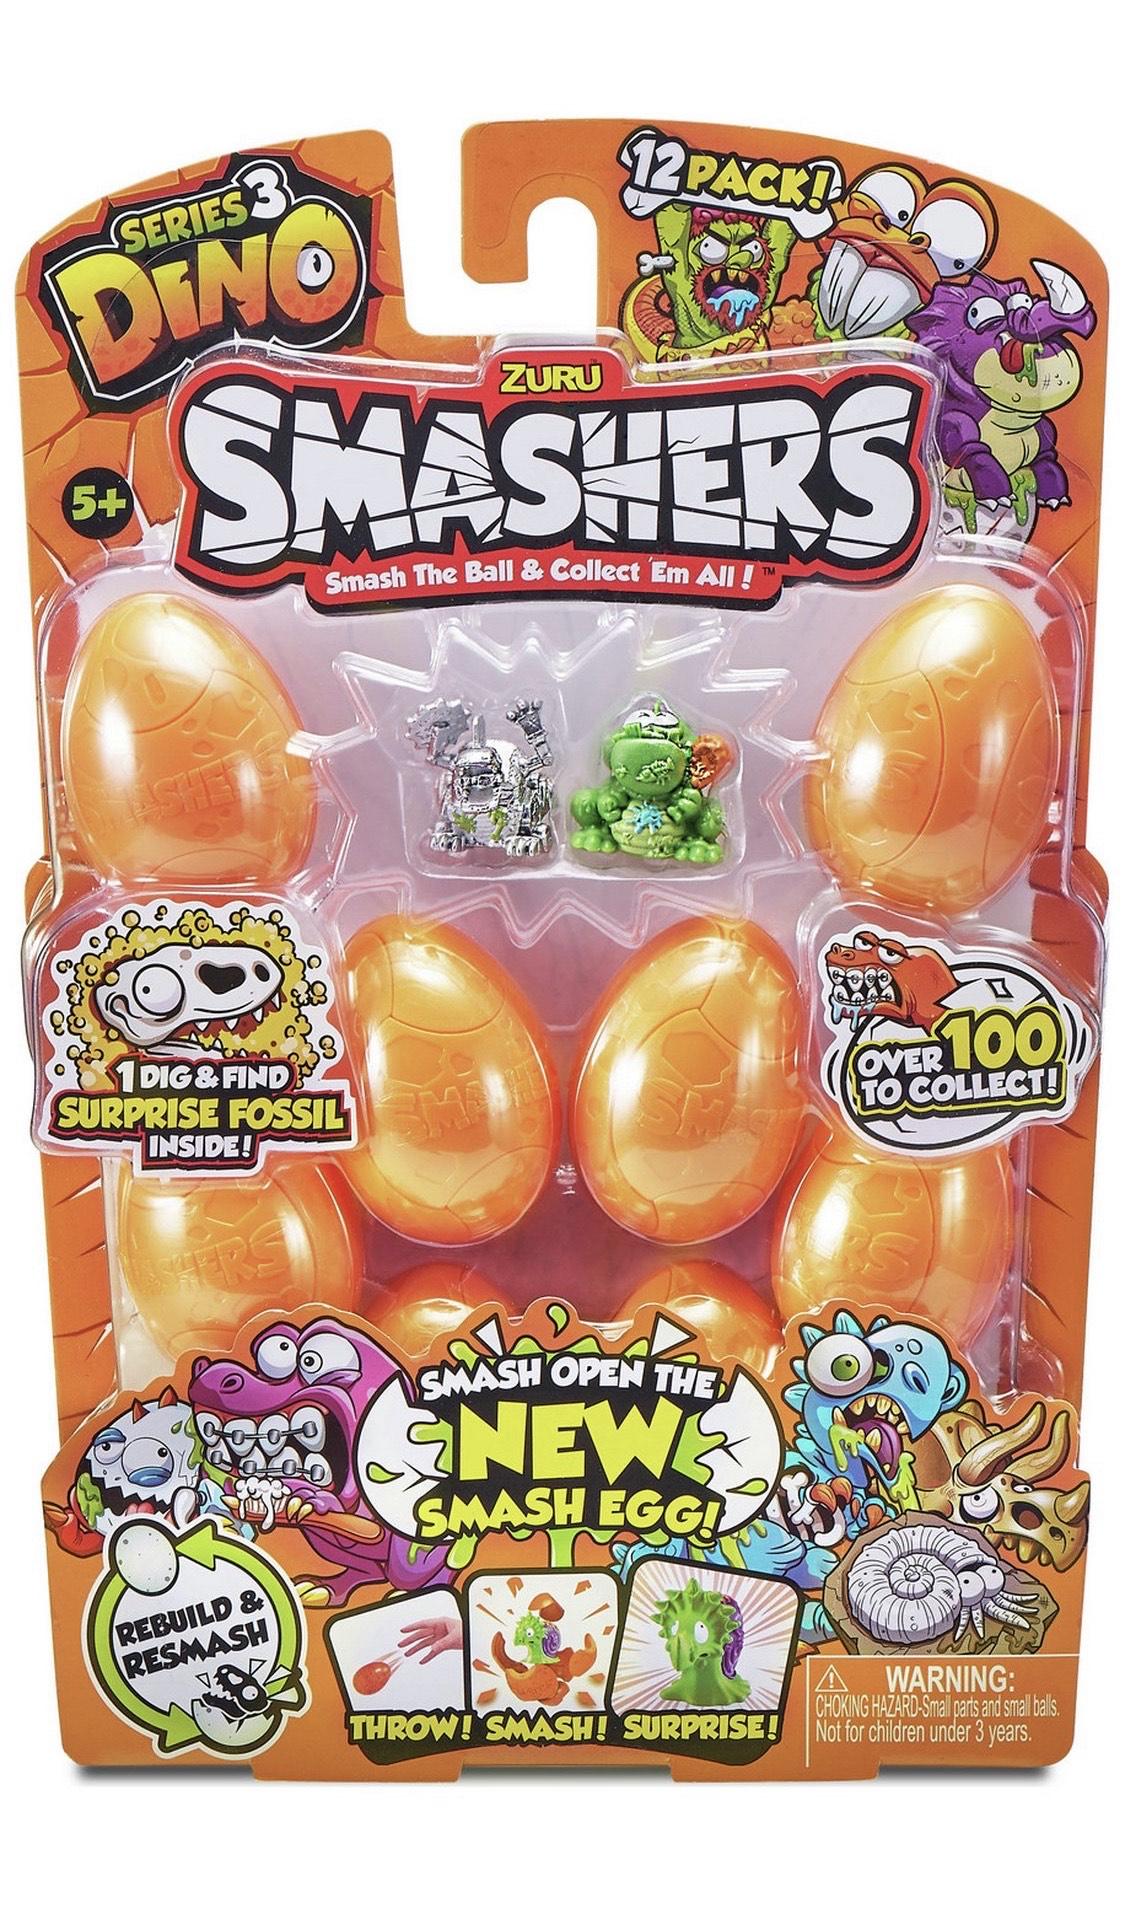 Zuru Smashers 12 Pack Series 3 £5.50 @ Argos